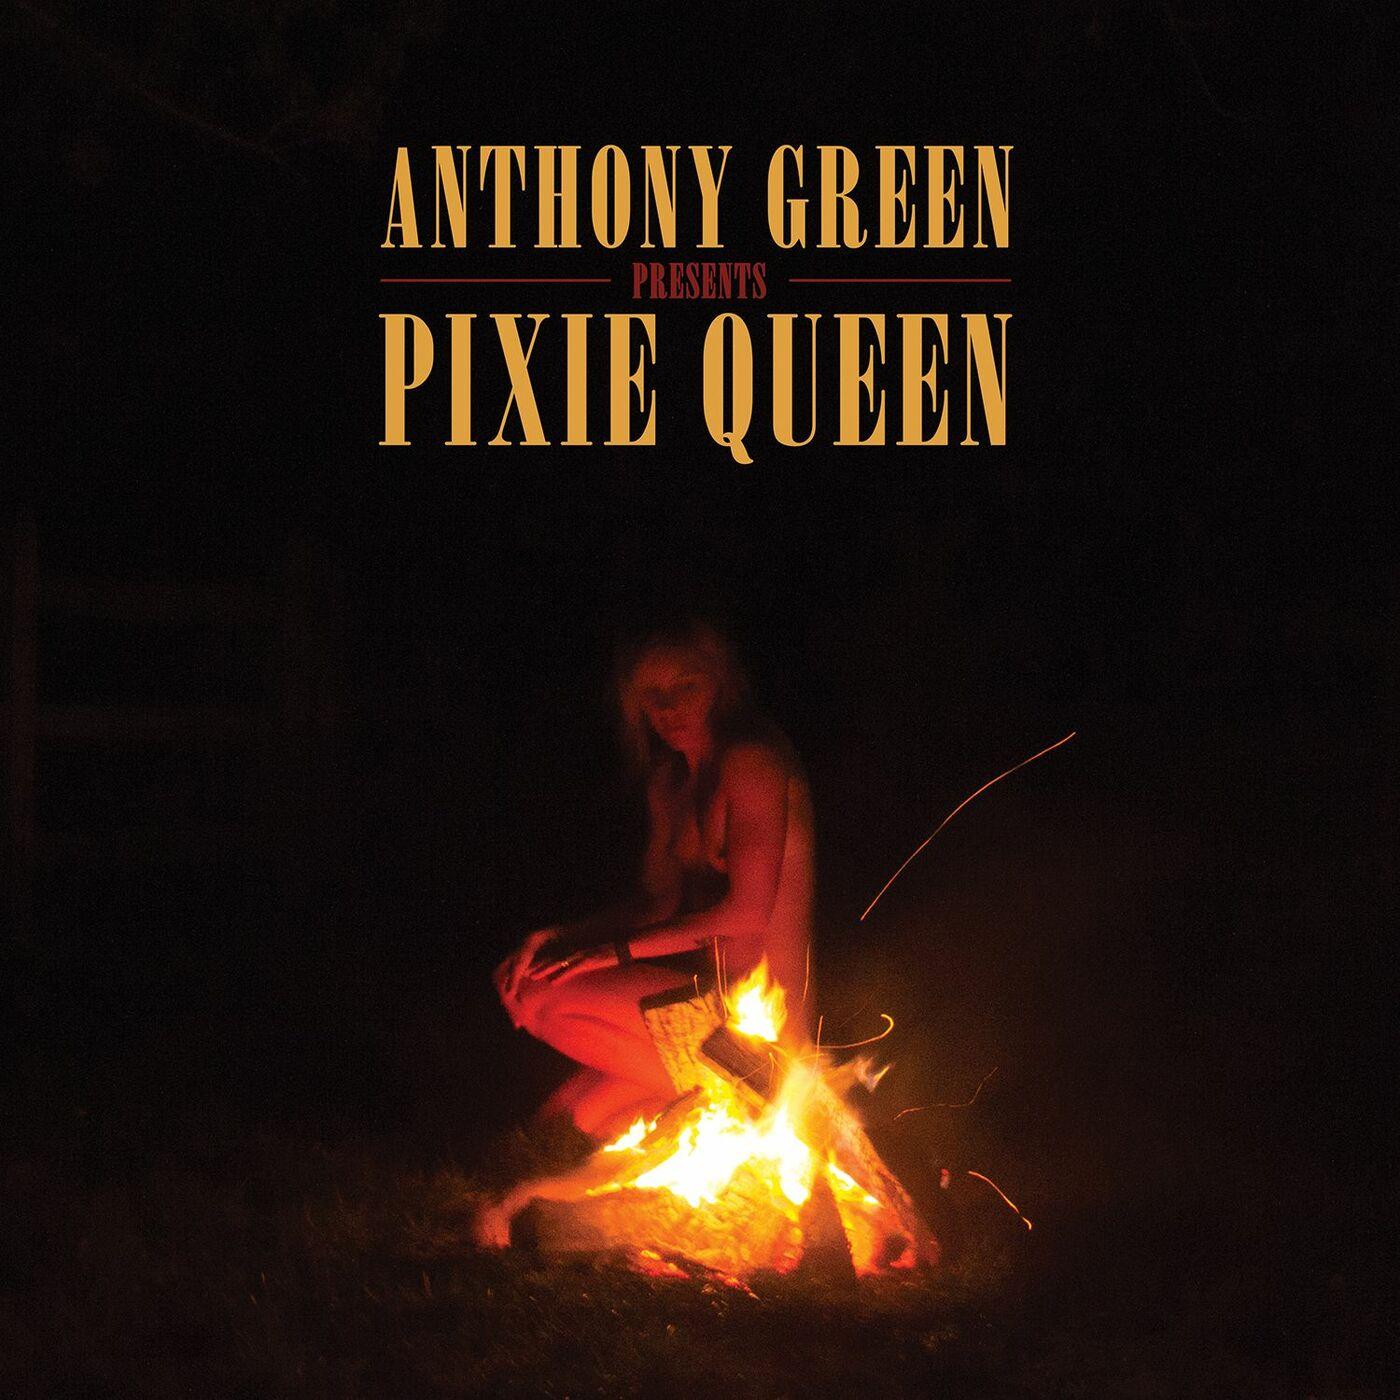 Anthony Green - Pixie Queen (2016)